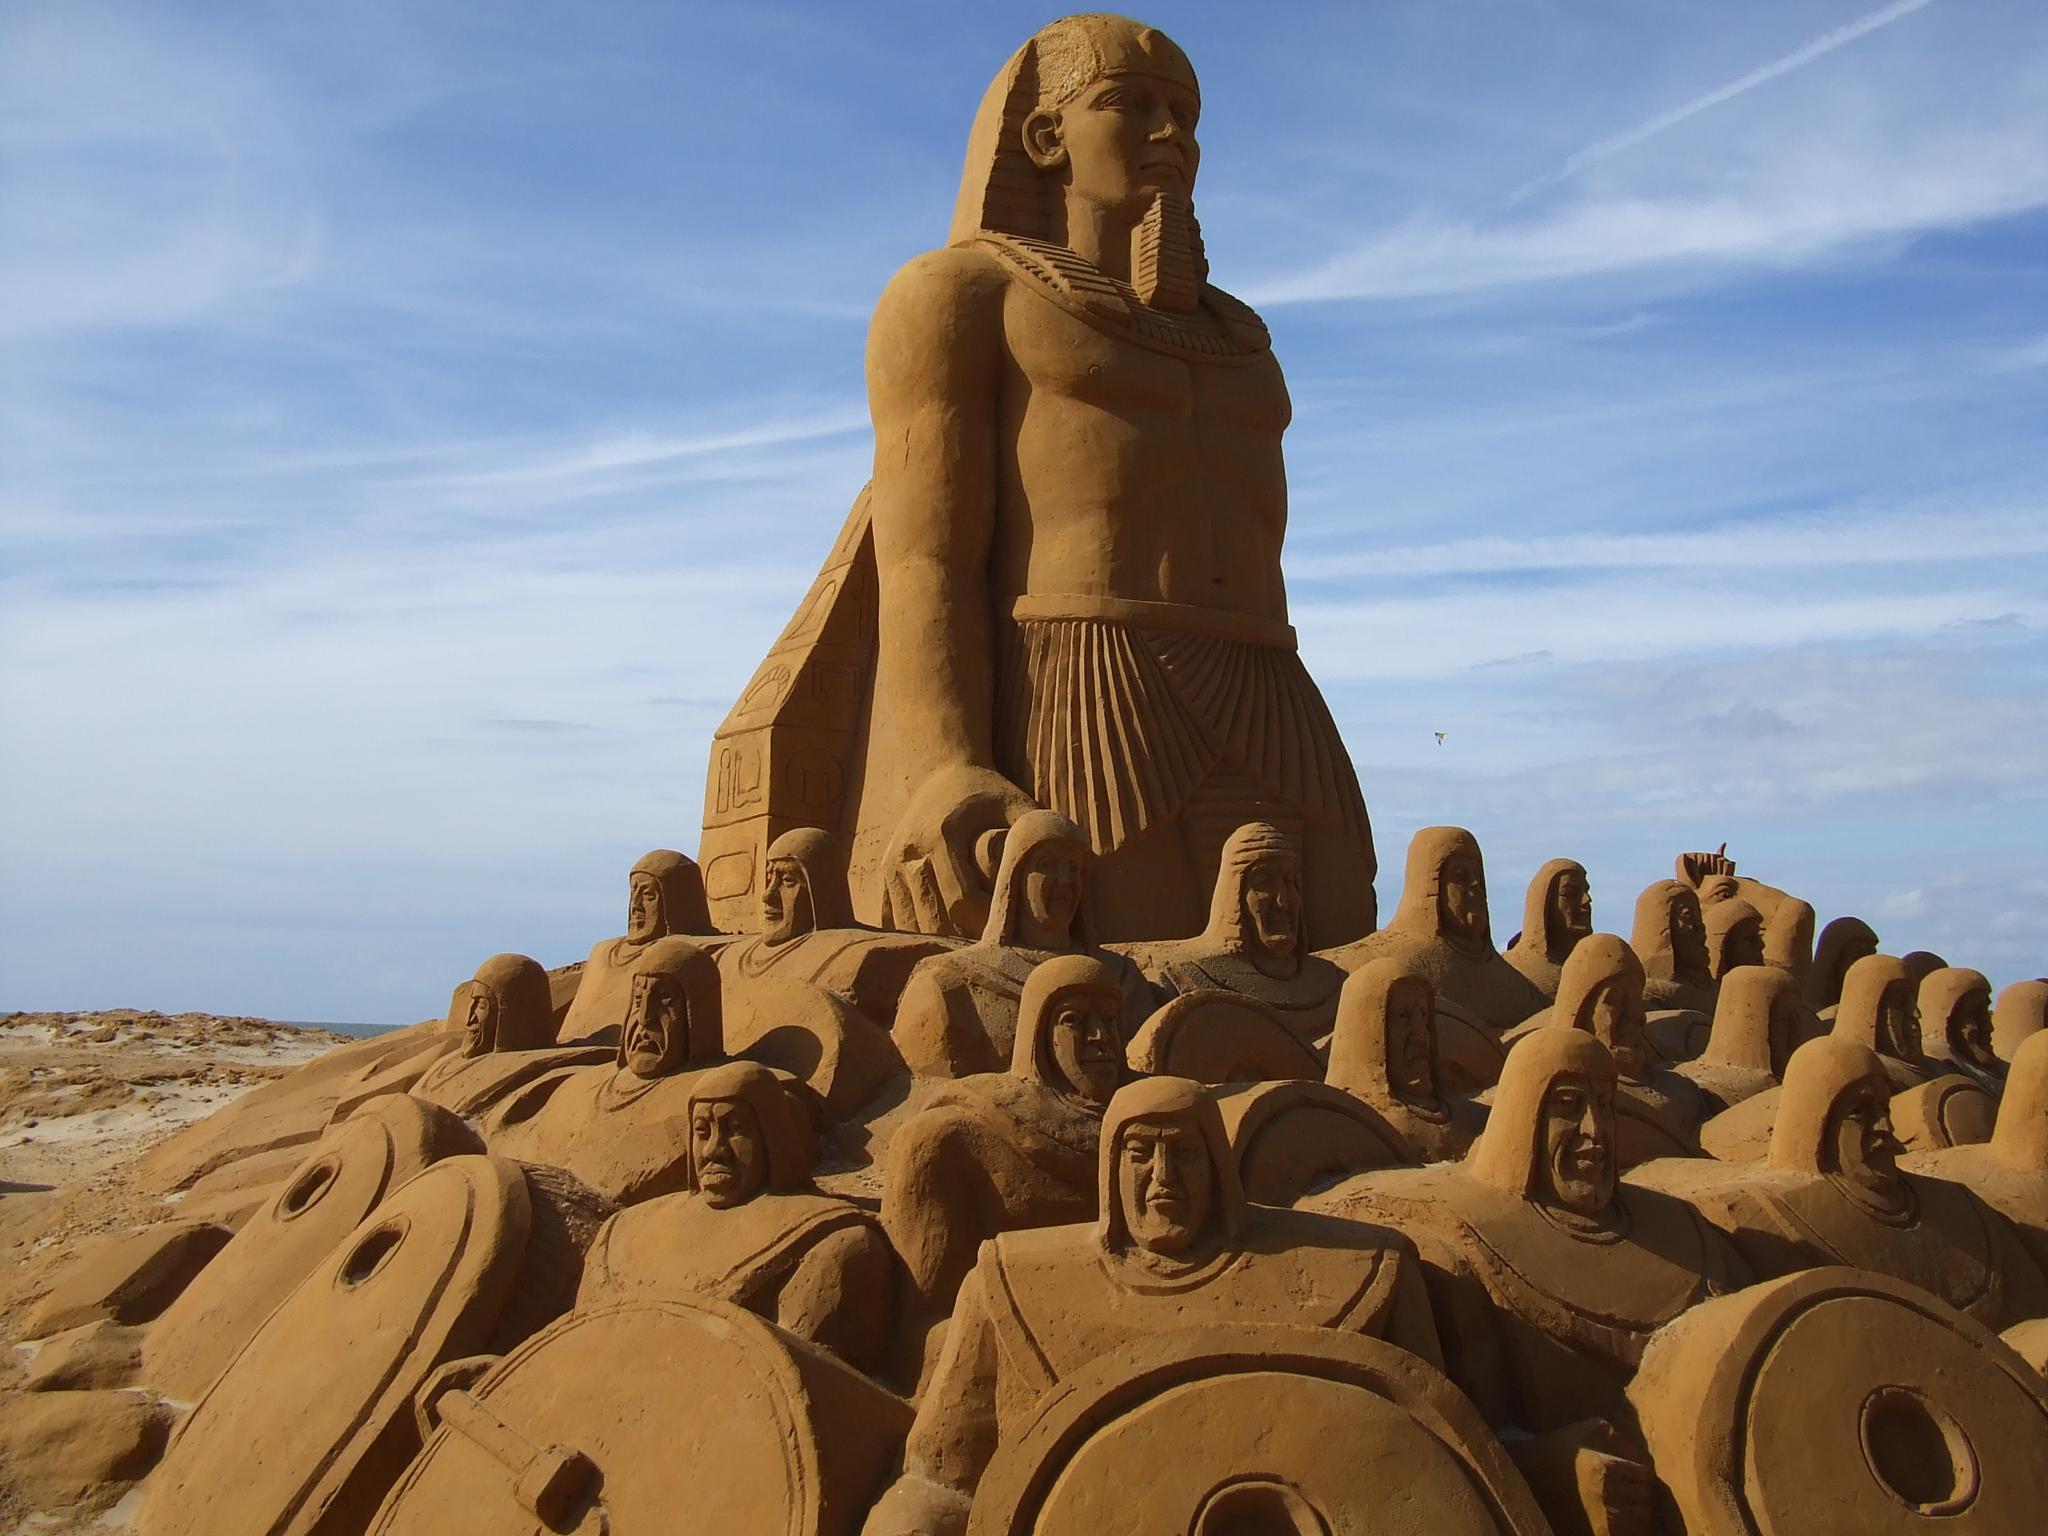 Beach sand sculpture by Bogfrog